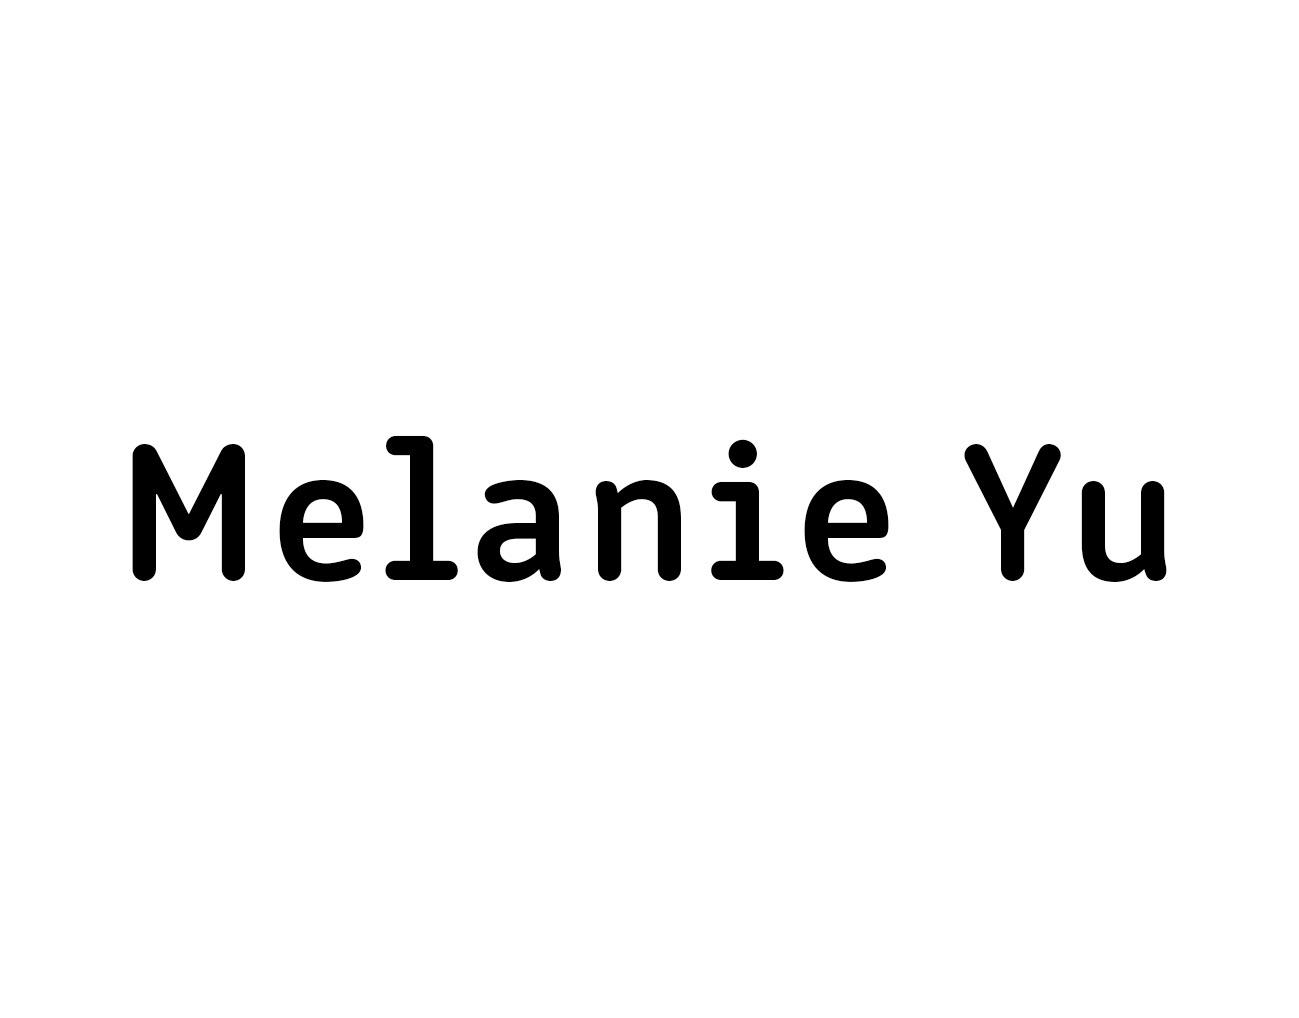 Melanie Yu